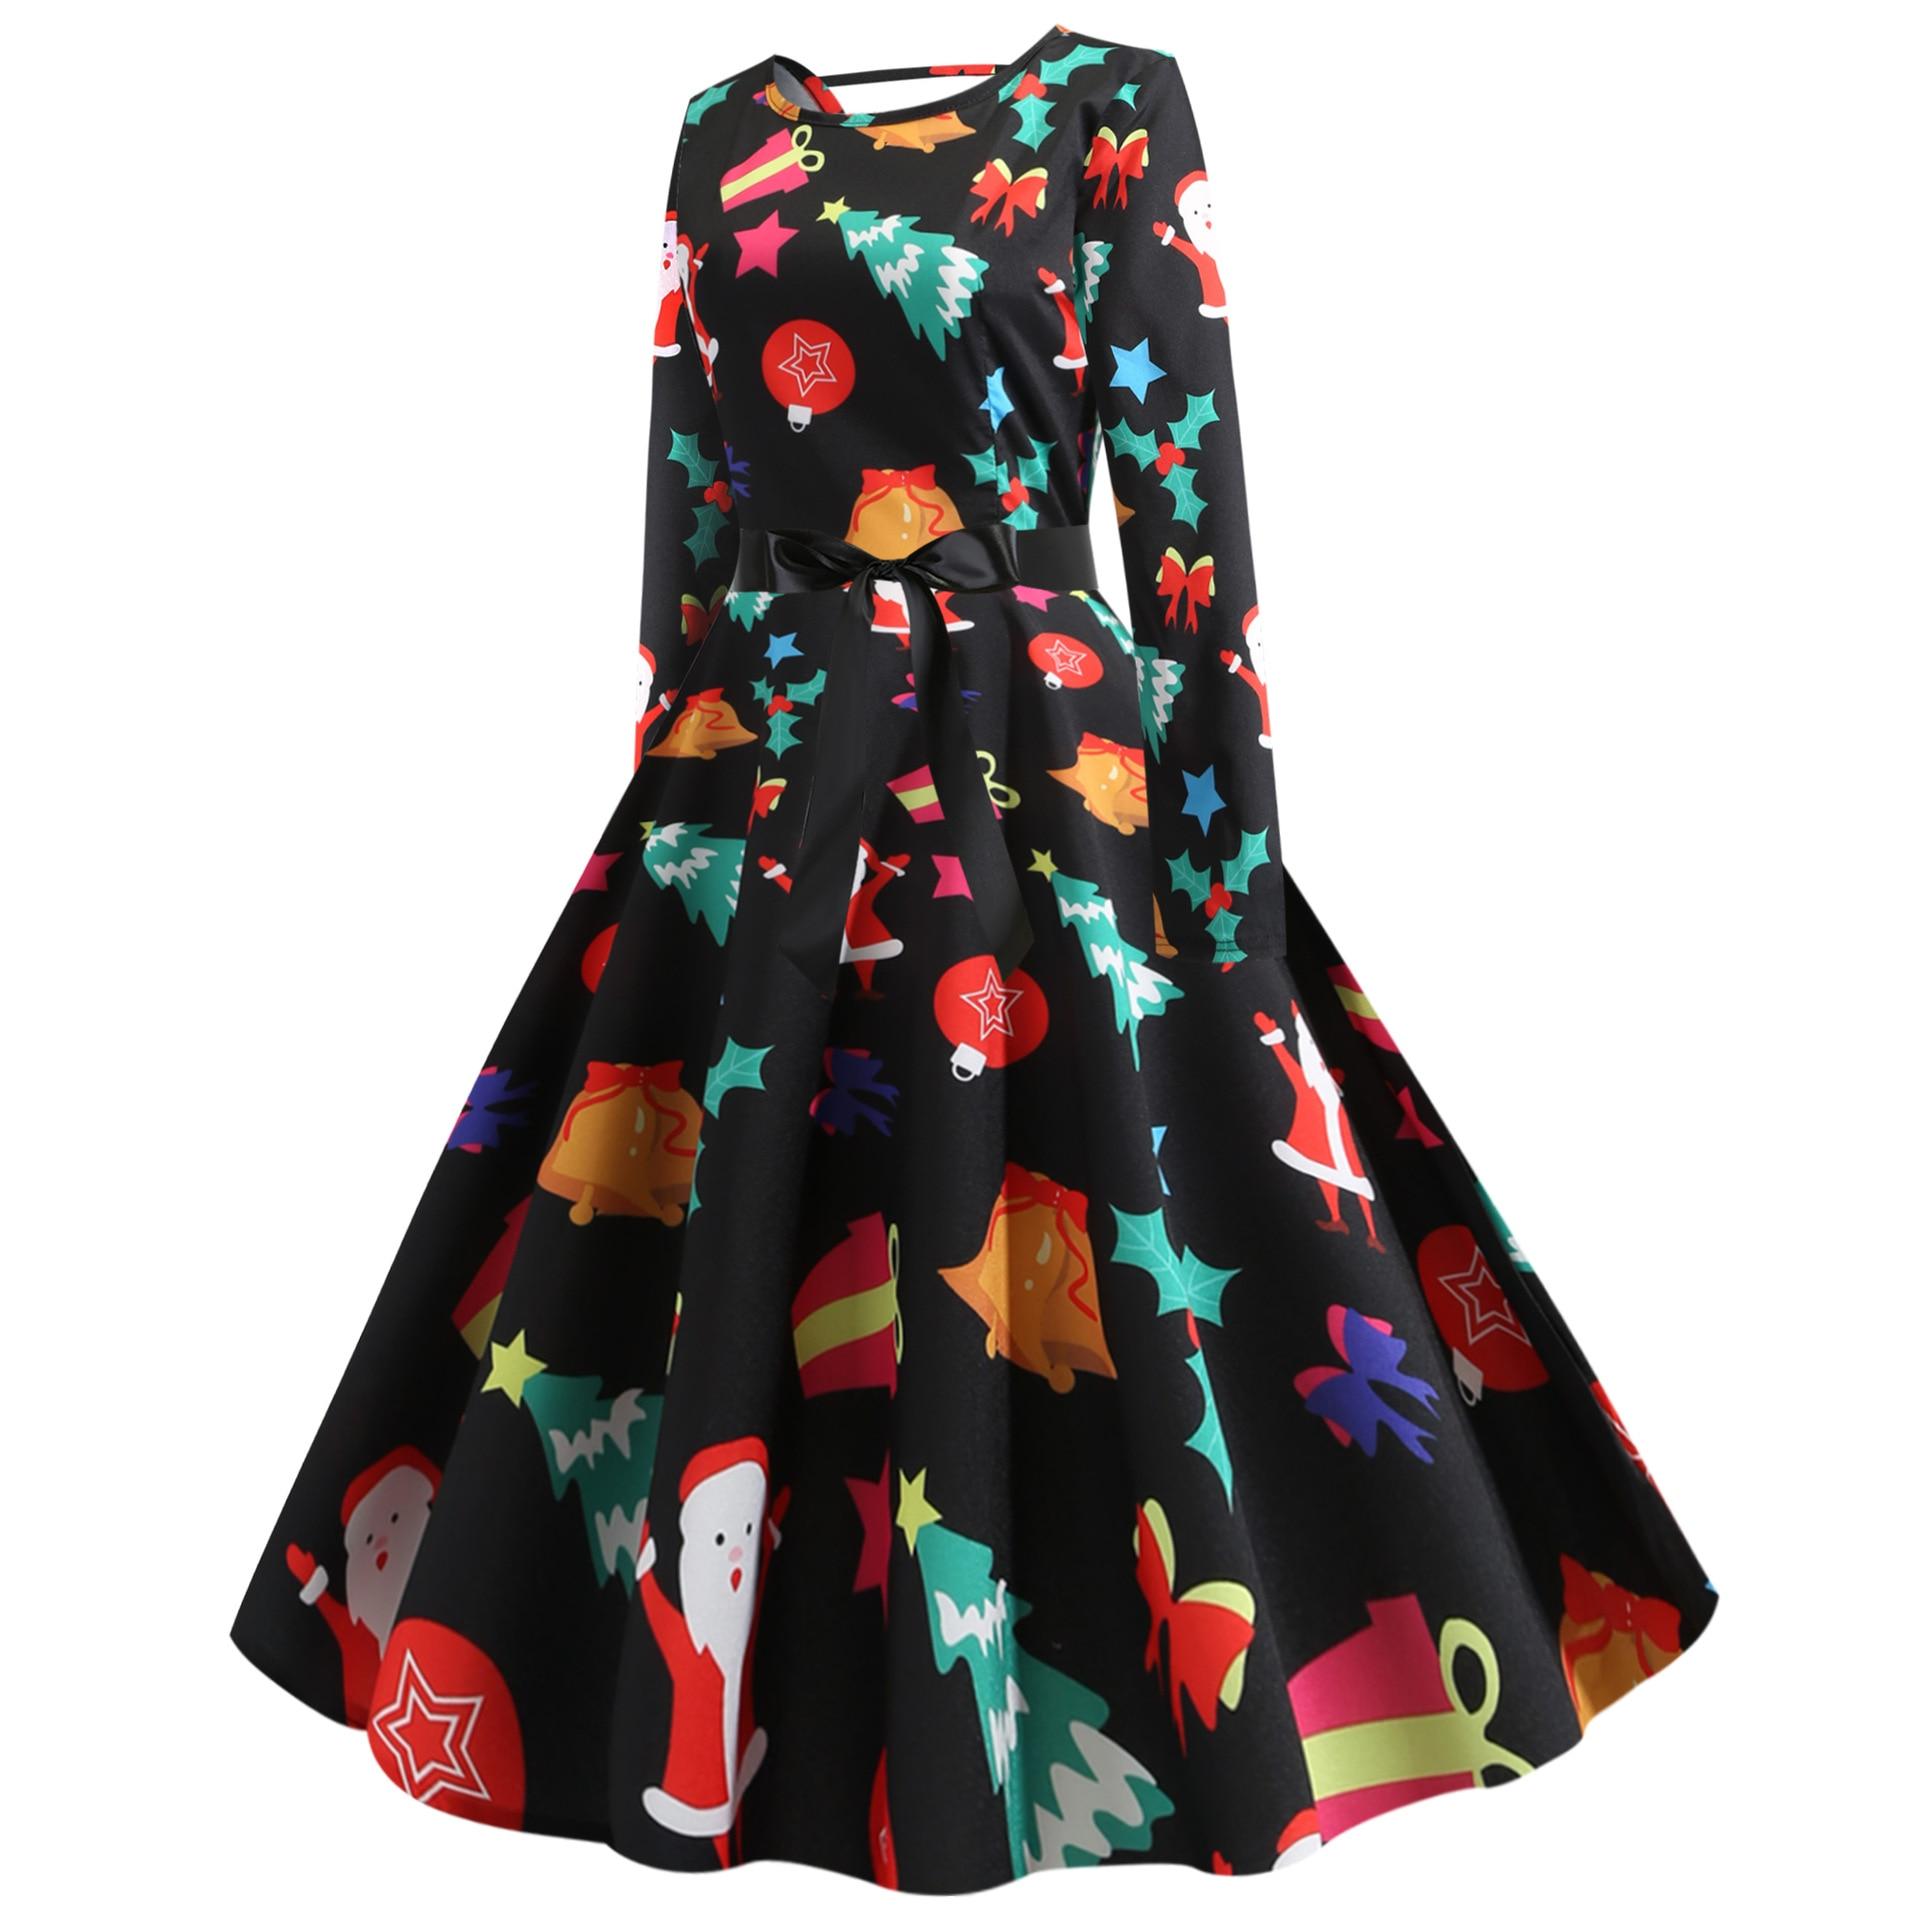 christmas dress vintage women plus size dresses party women clothes print sexy dresses party night club